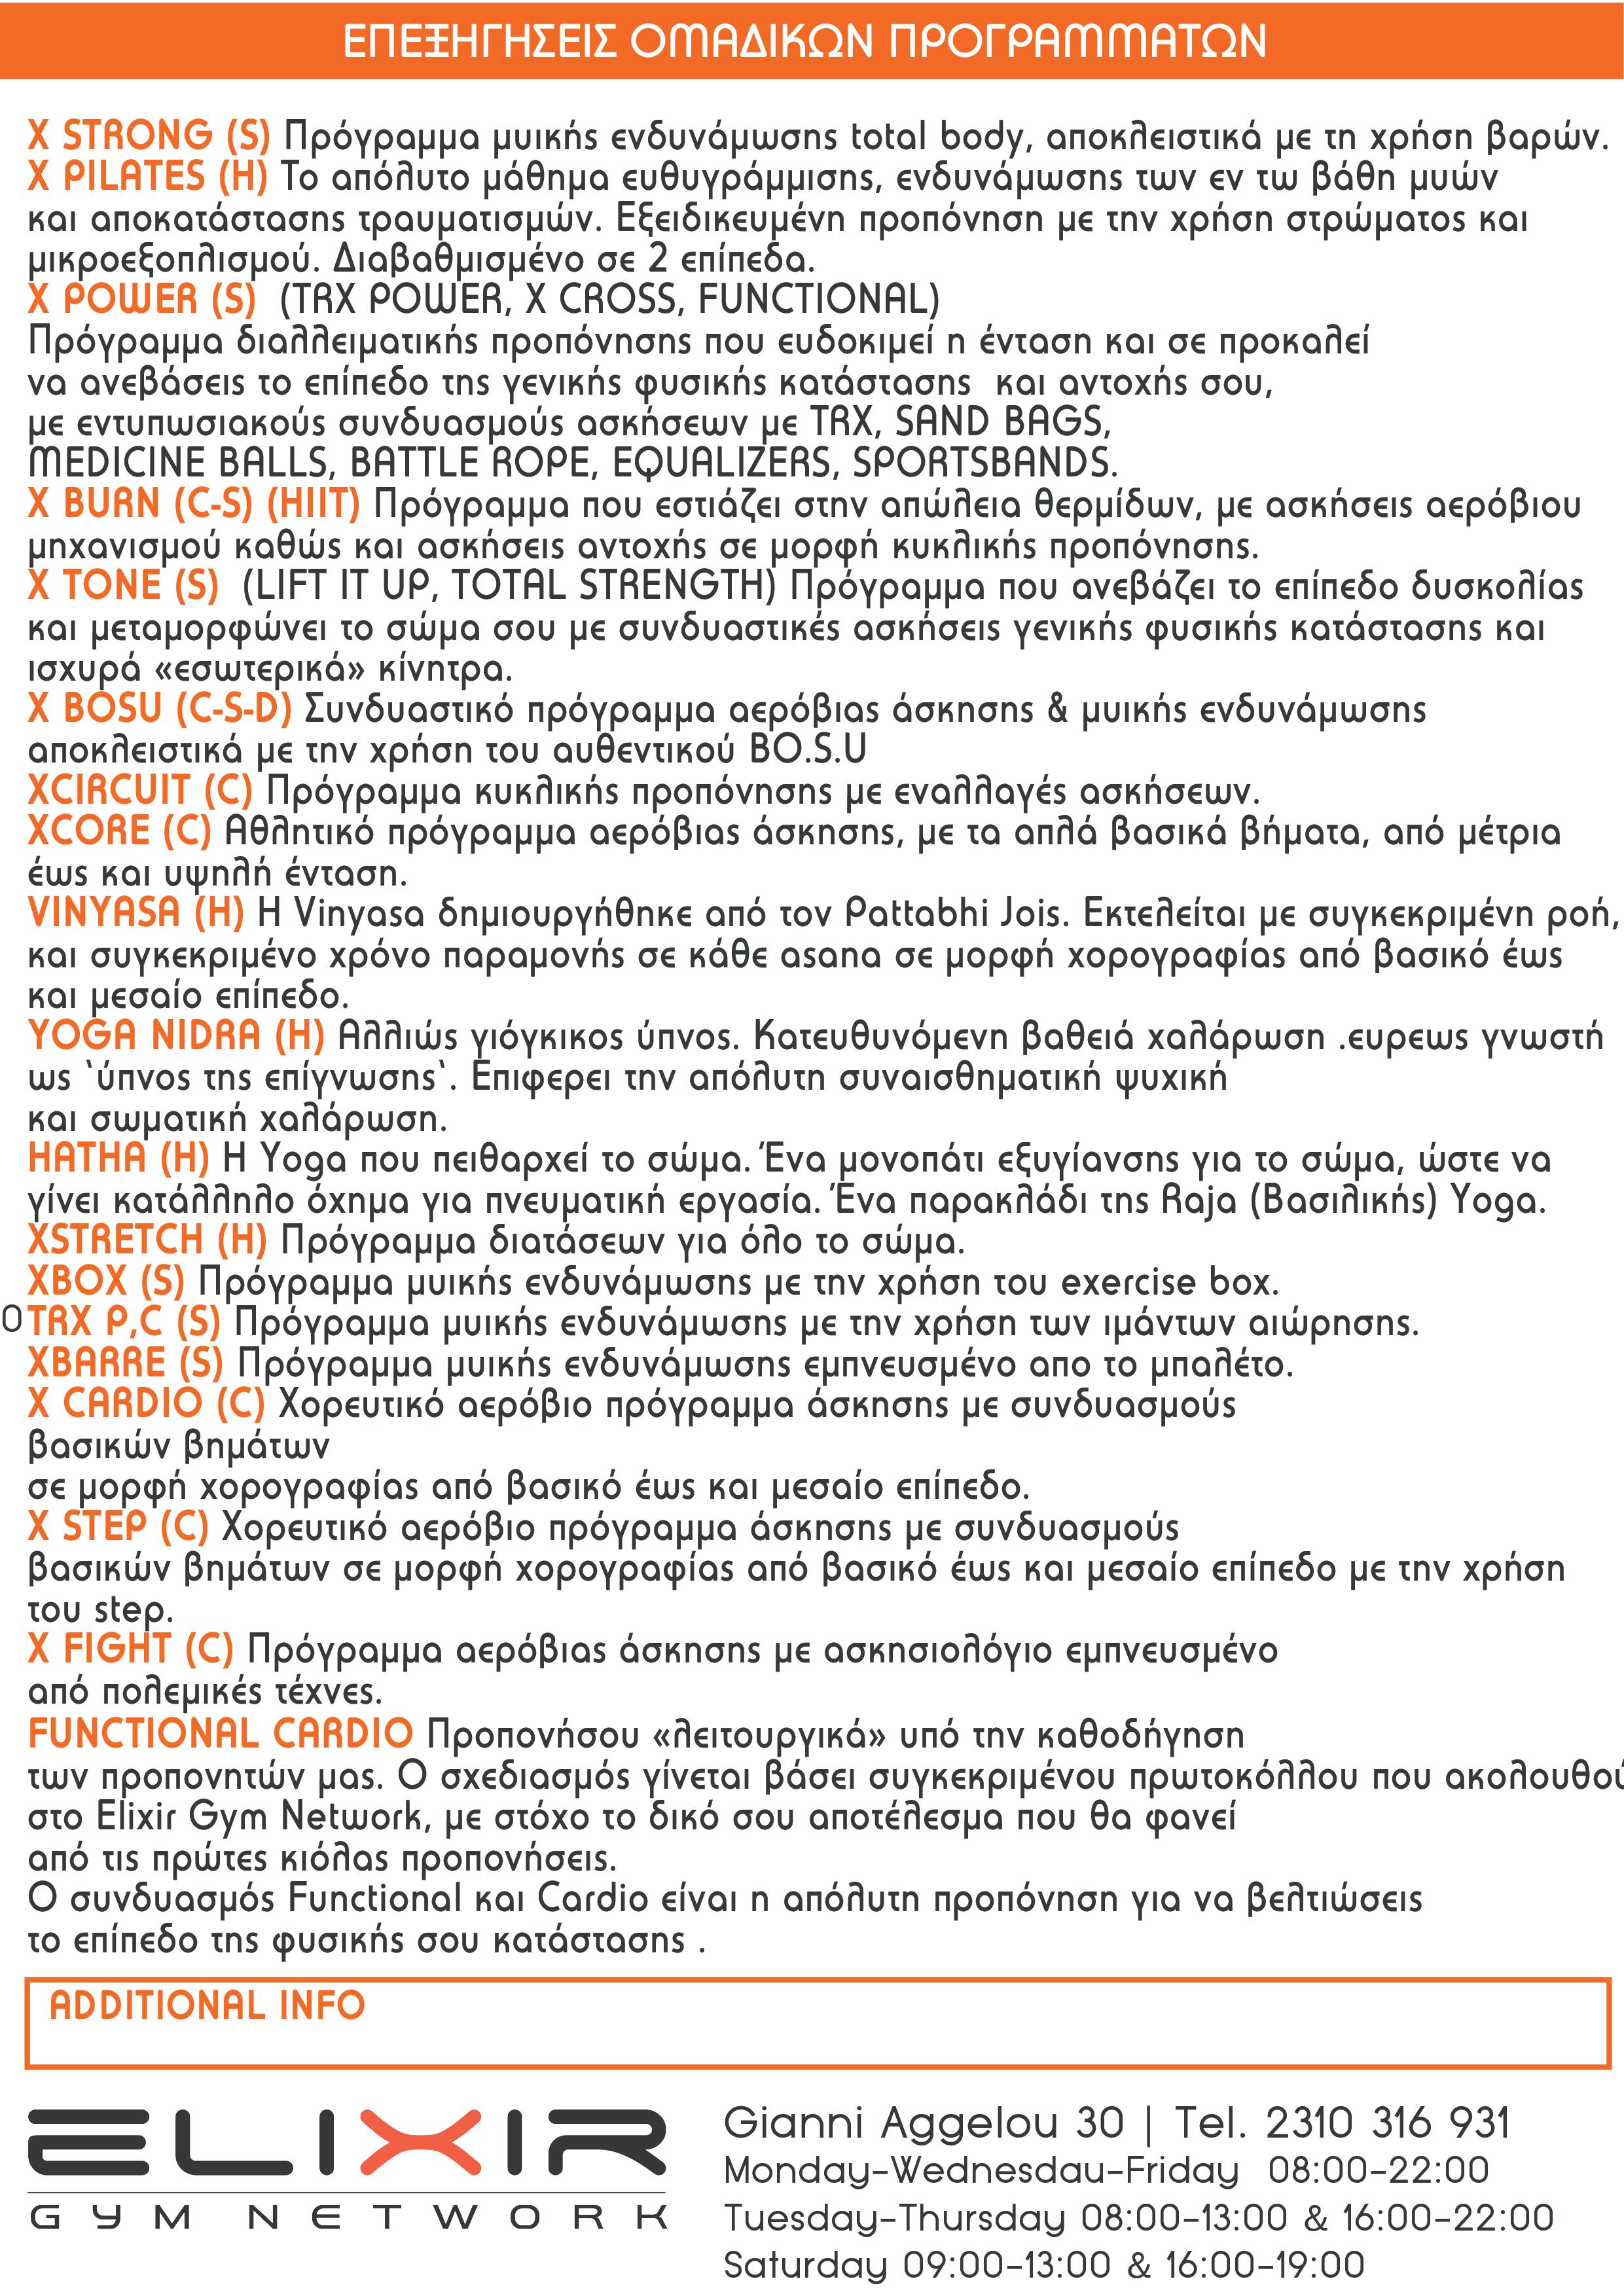 Charilaou Elixir Gym & Pilates Studio Schedule